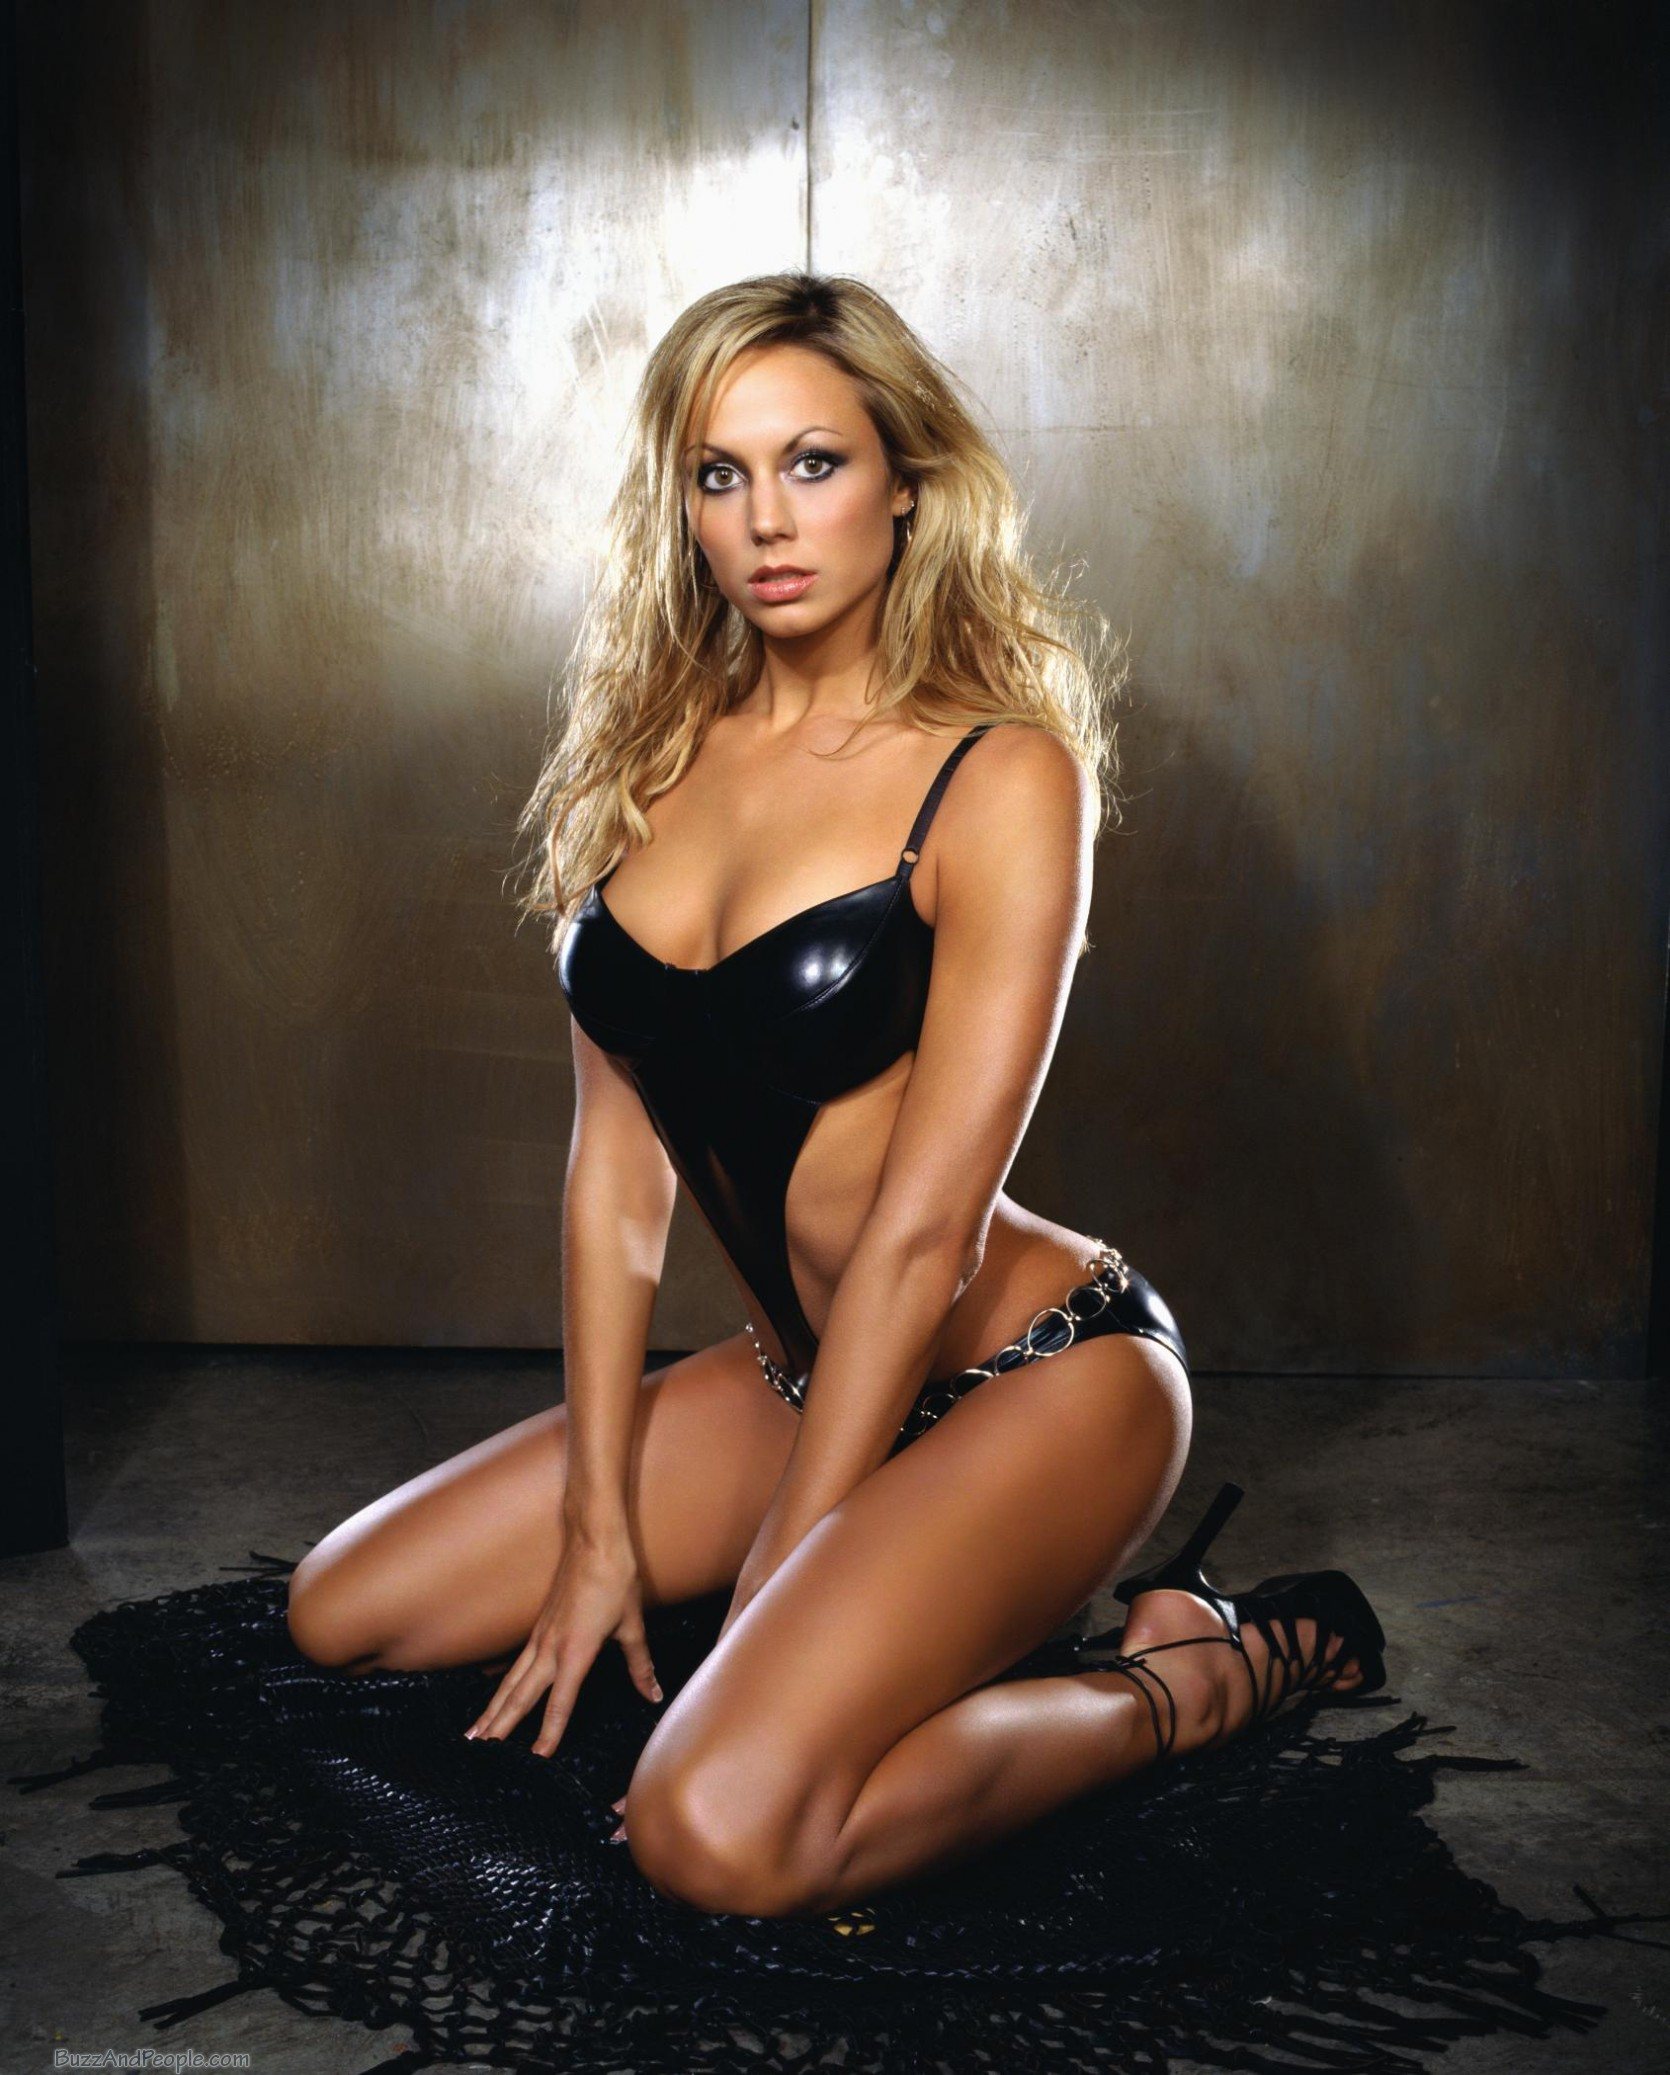 Wallpaper Stacy Keibler sexy hot Sexe & Charme